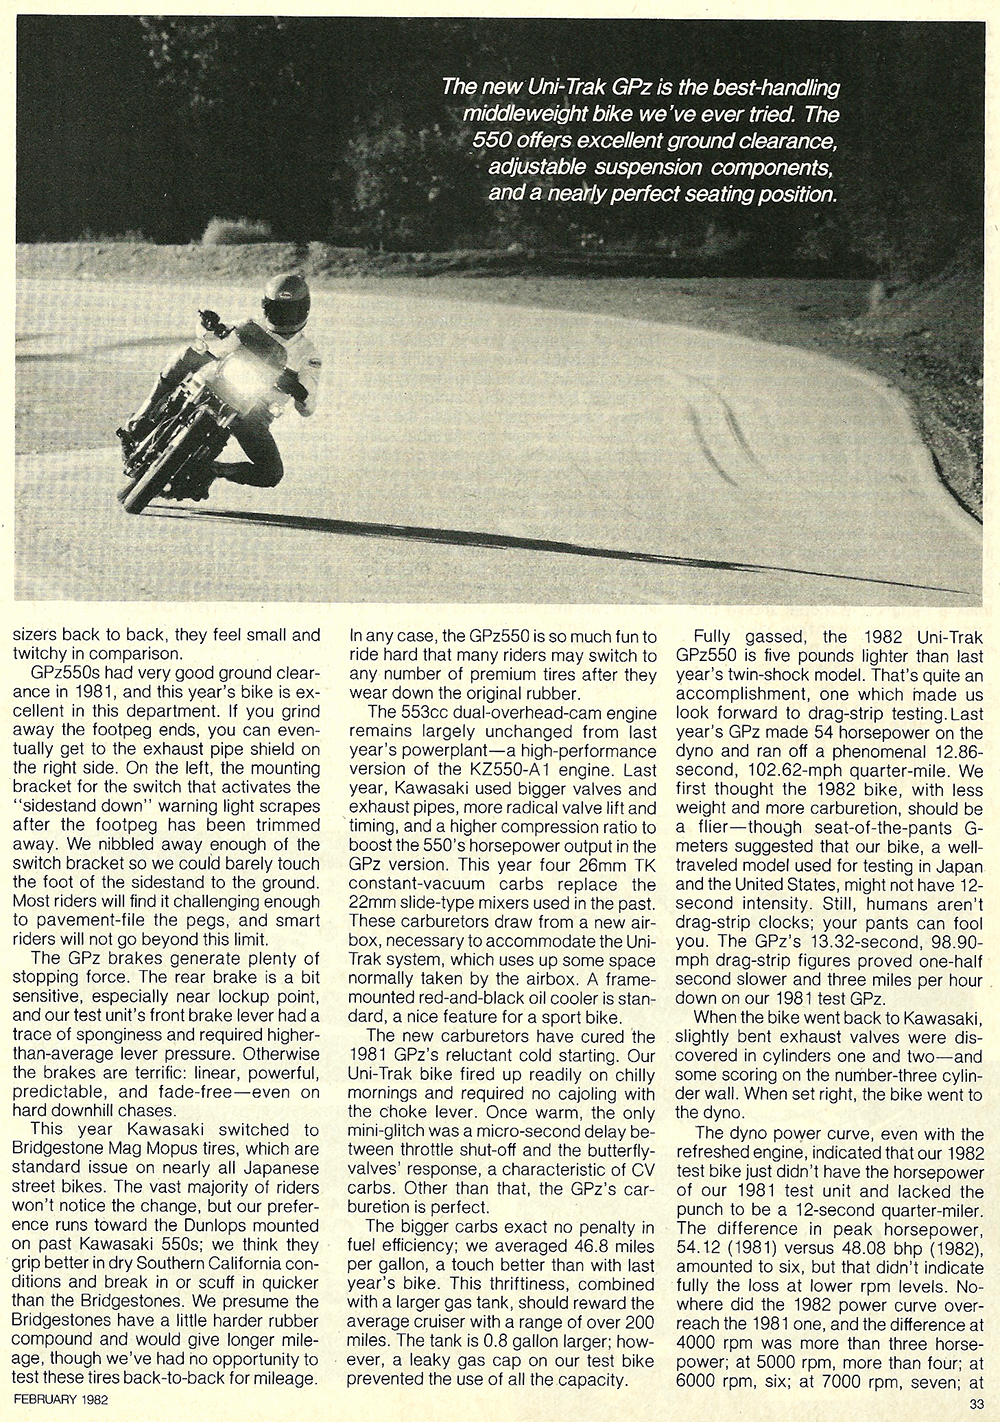 1982 Kawasaki GPz550 road test 06.jpg